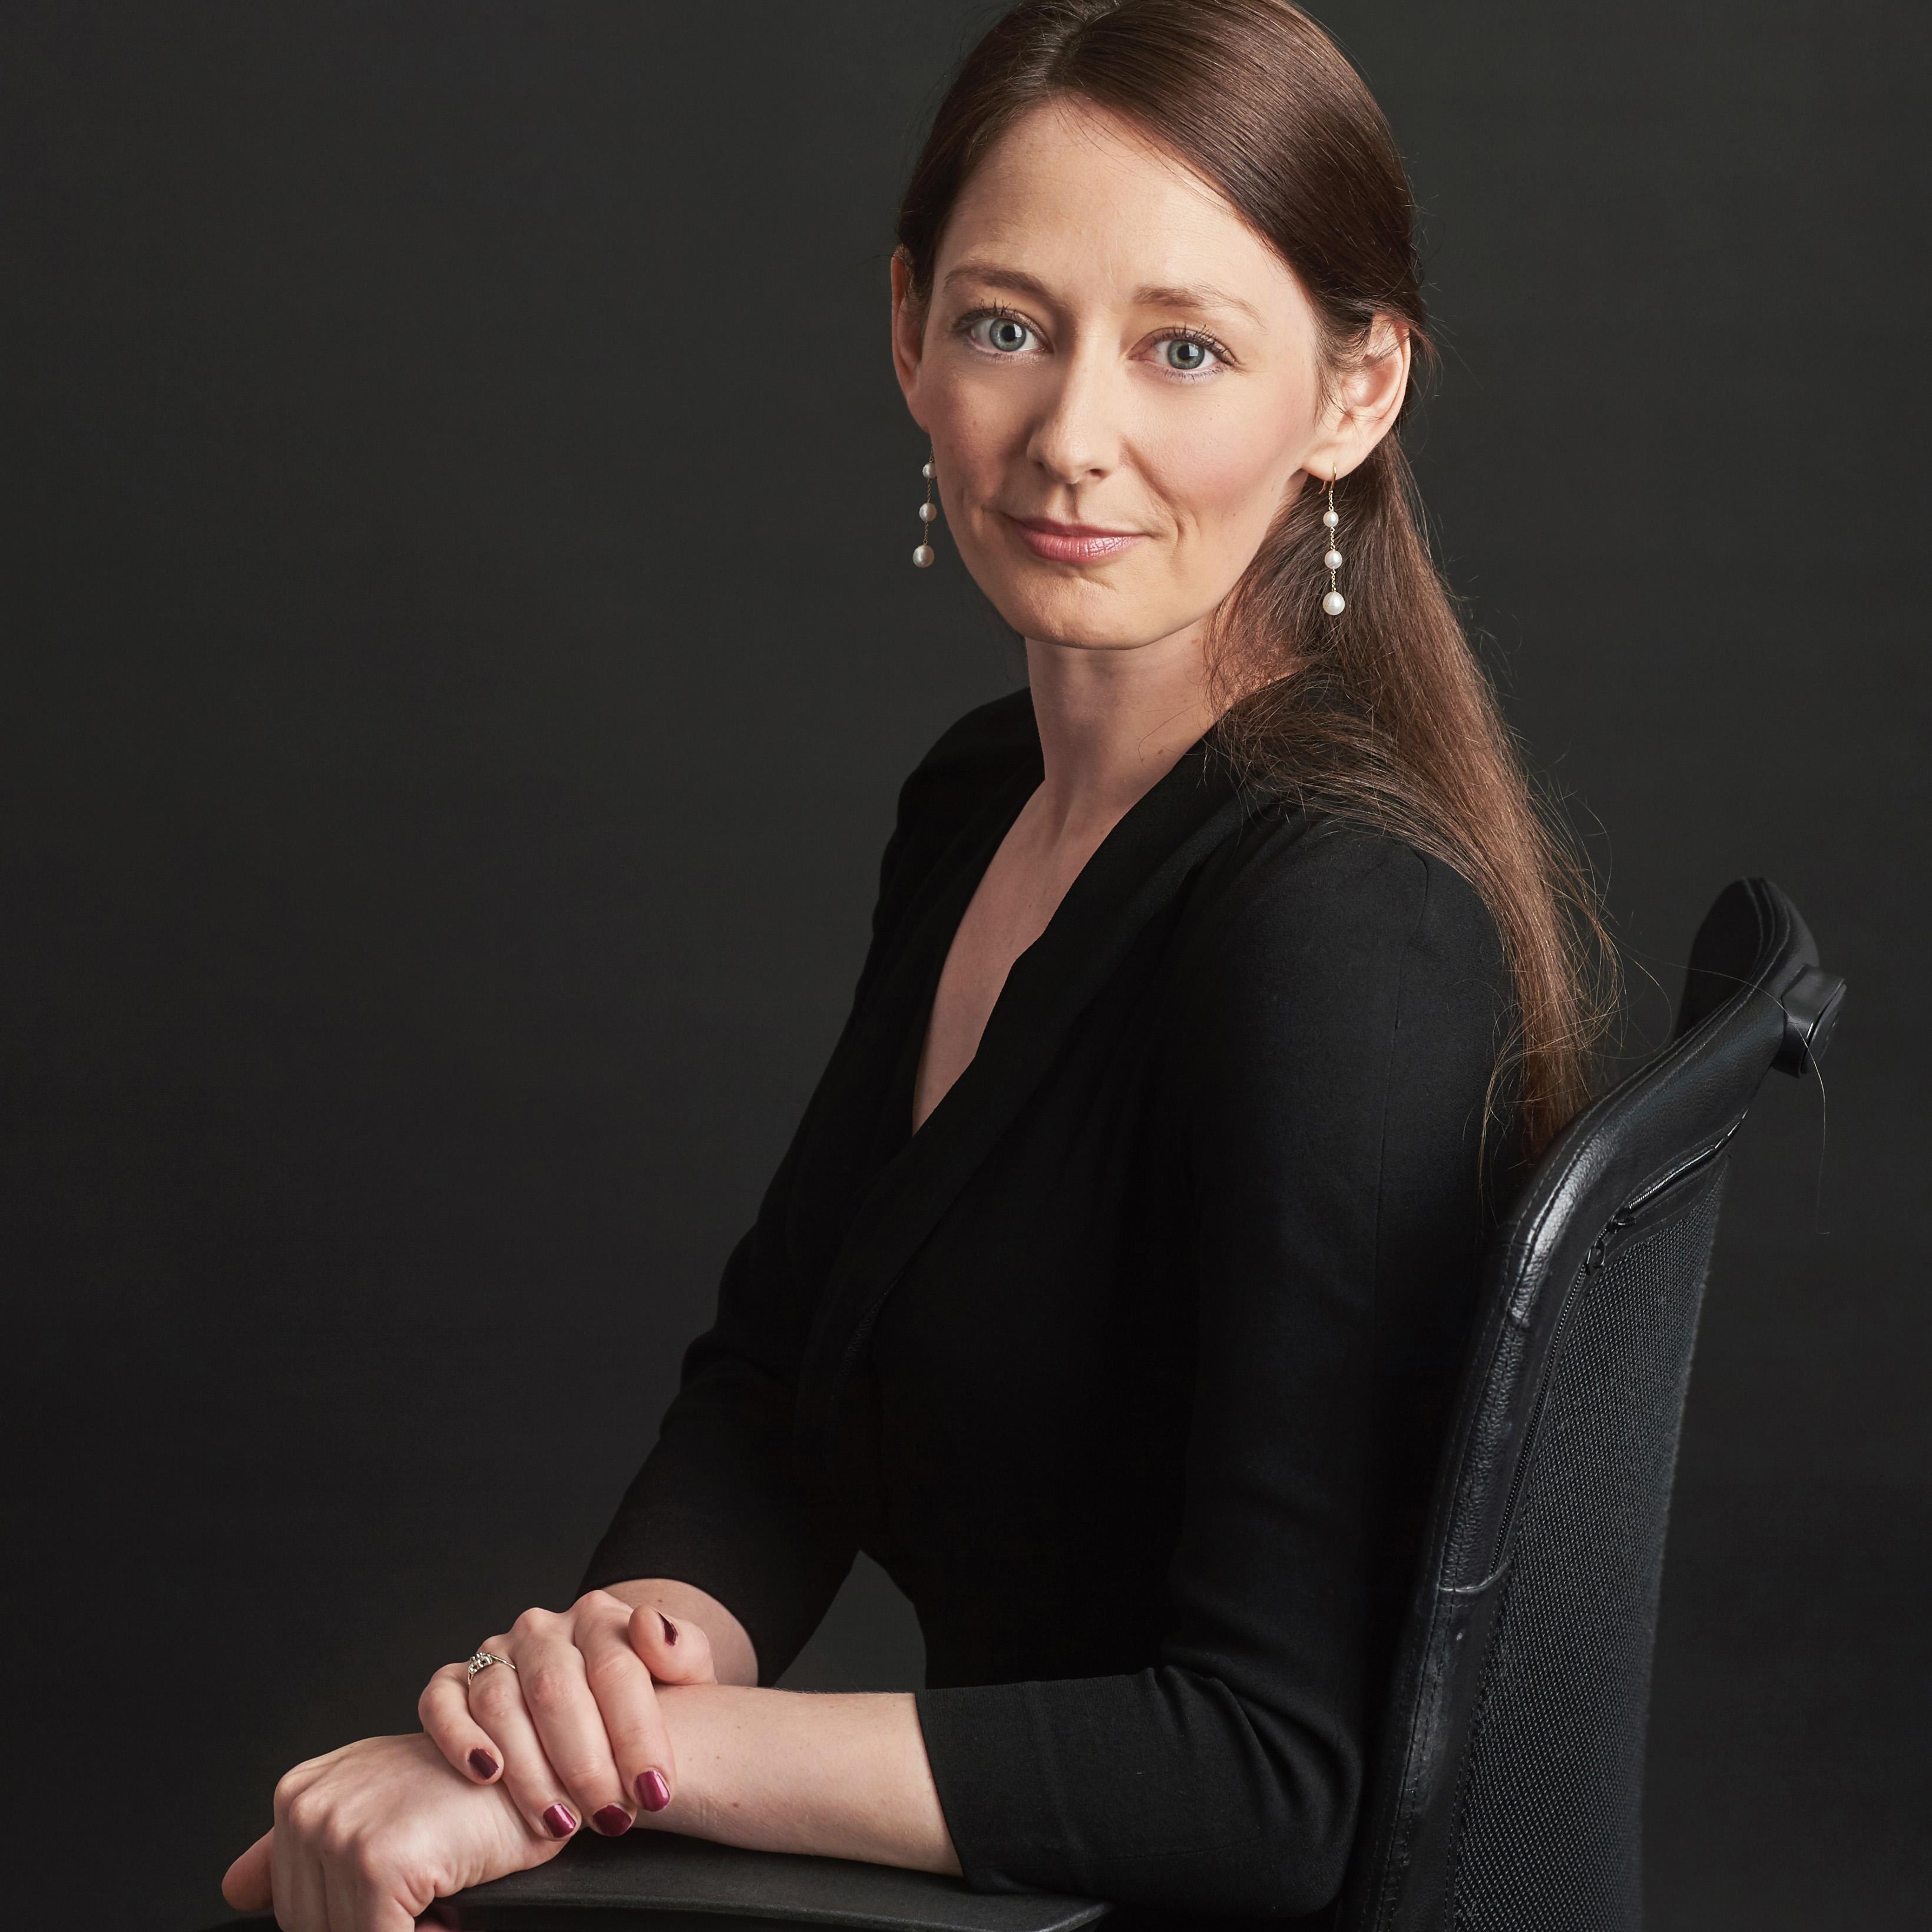 Dr. Catherine Taroni